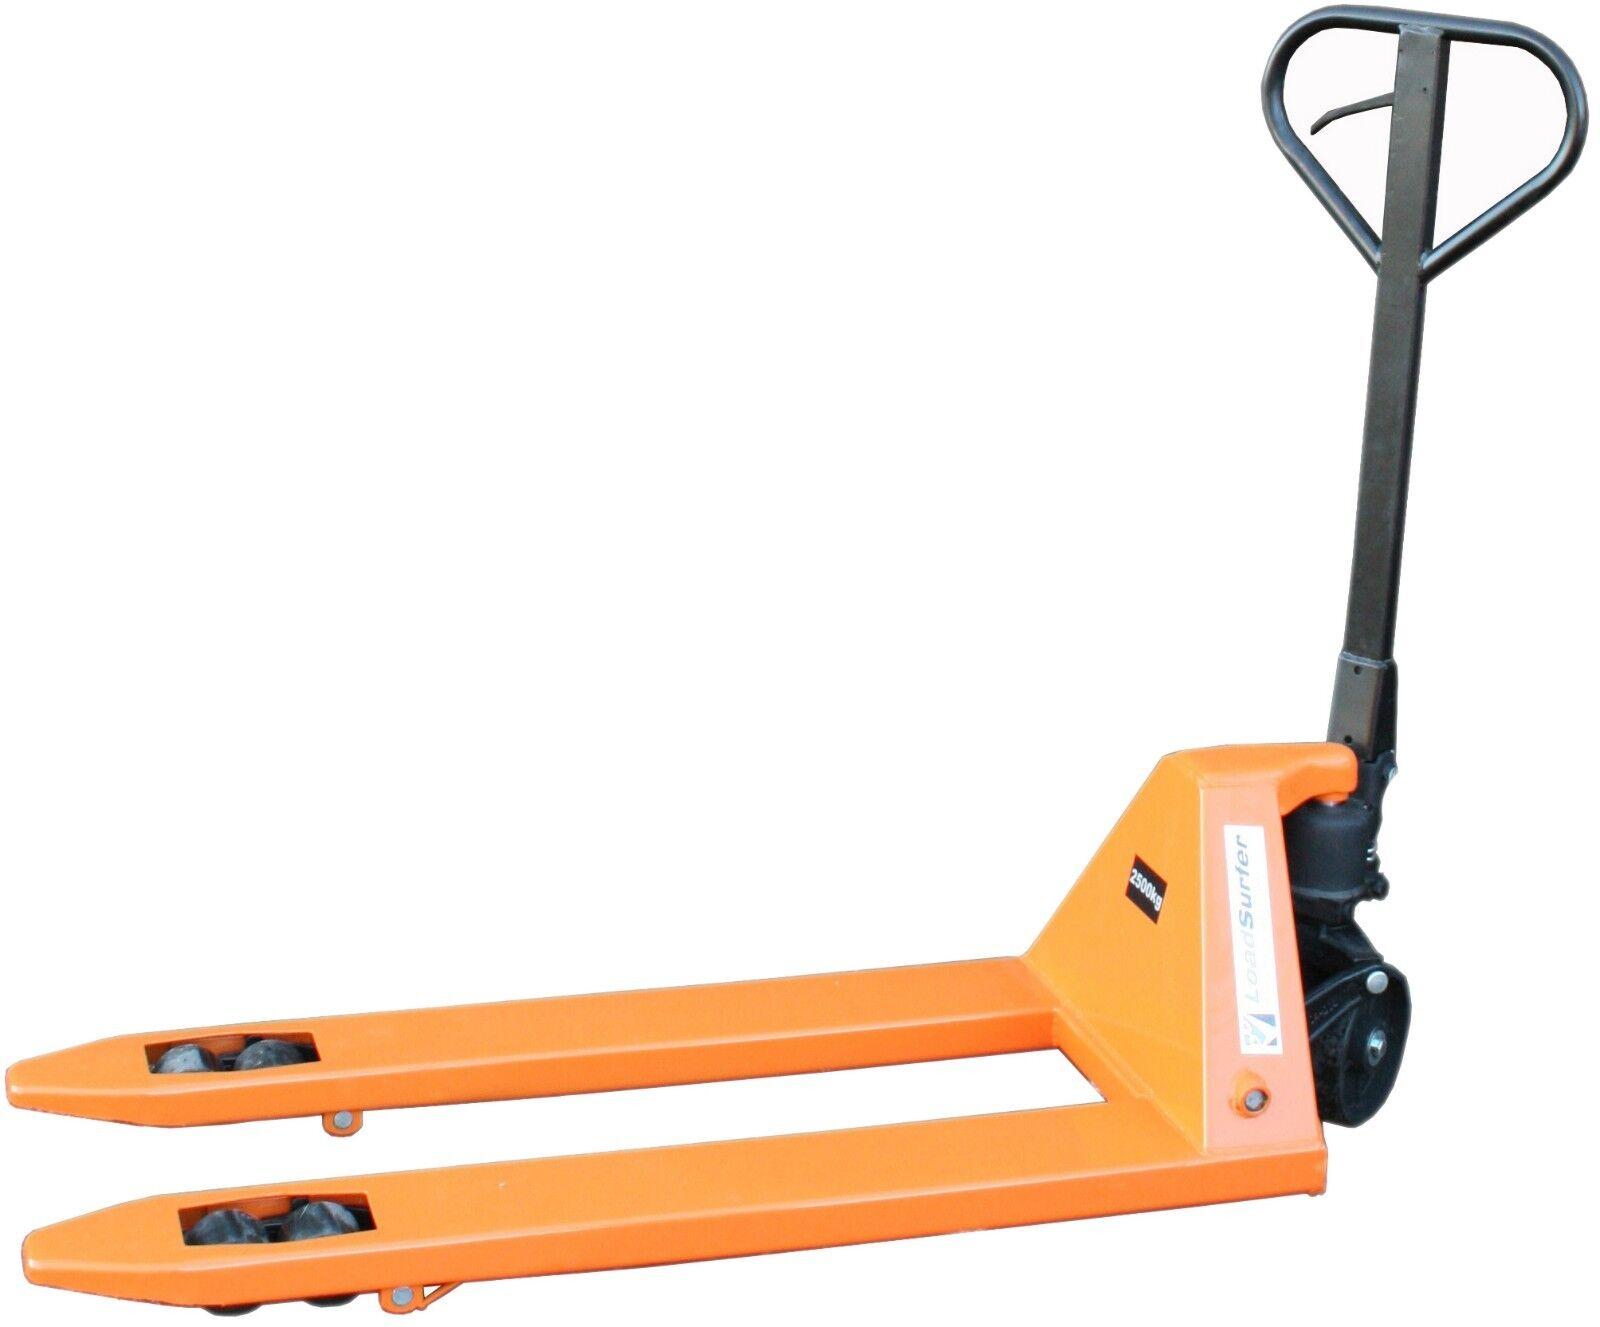 Pump up pallet truck bosch 680w 240v corded keyless chuck hammer drill psb680re